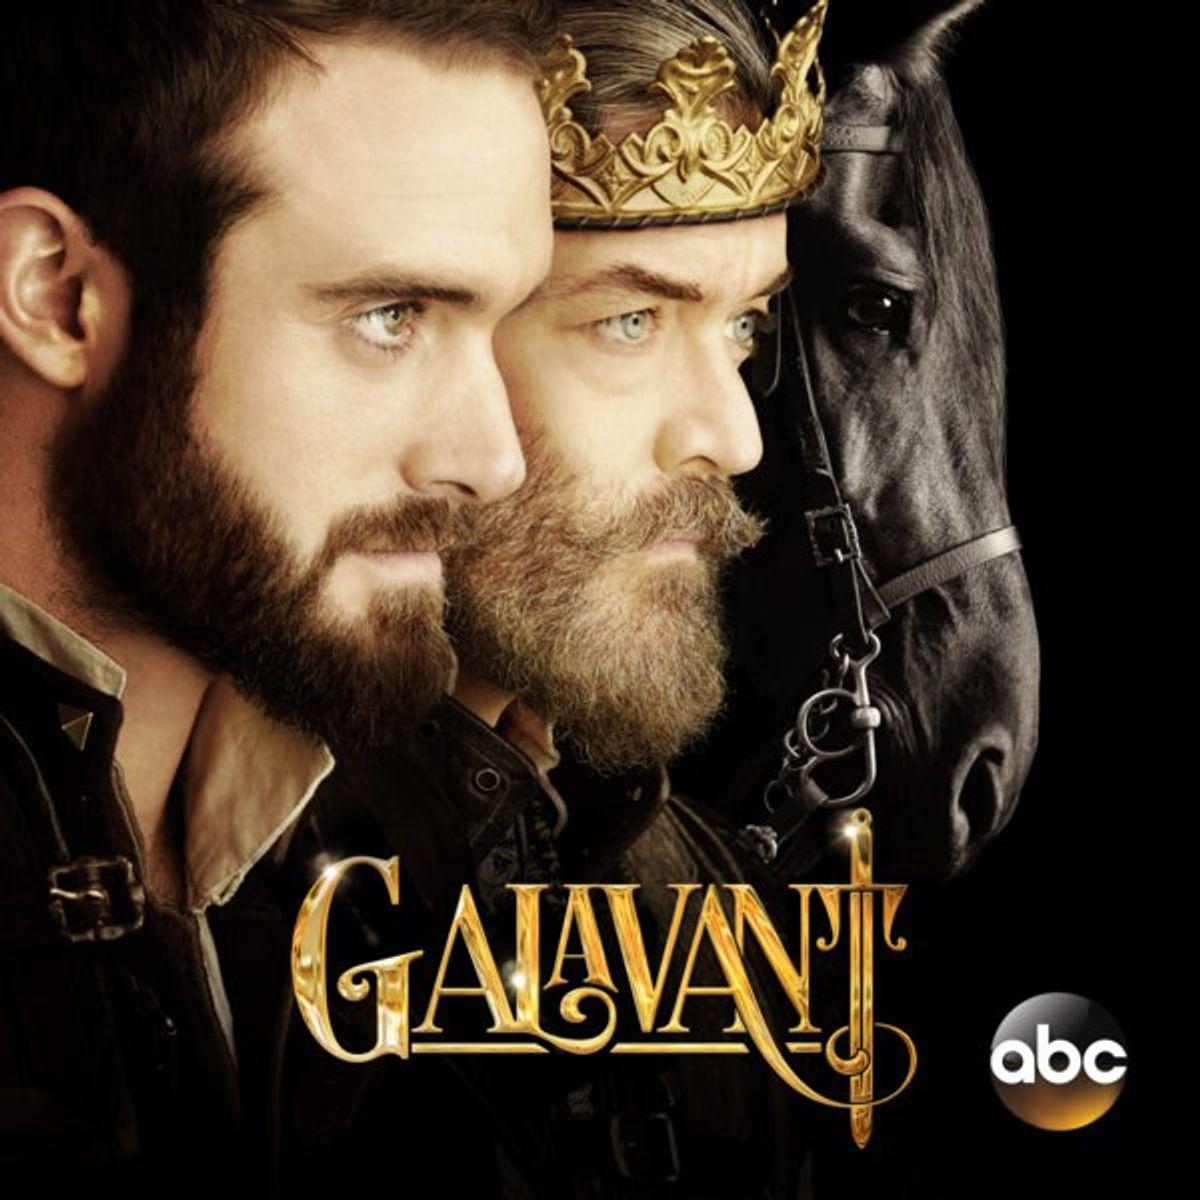 What is Galavant?